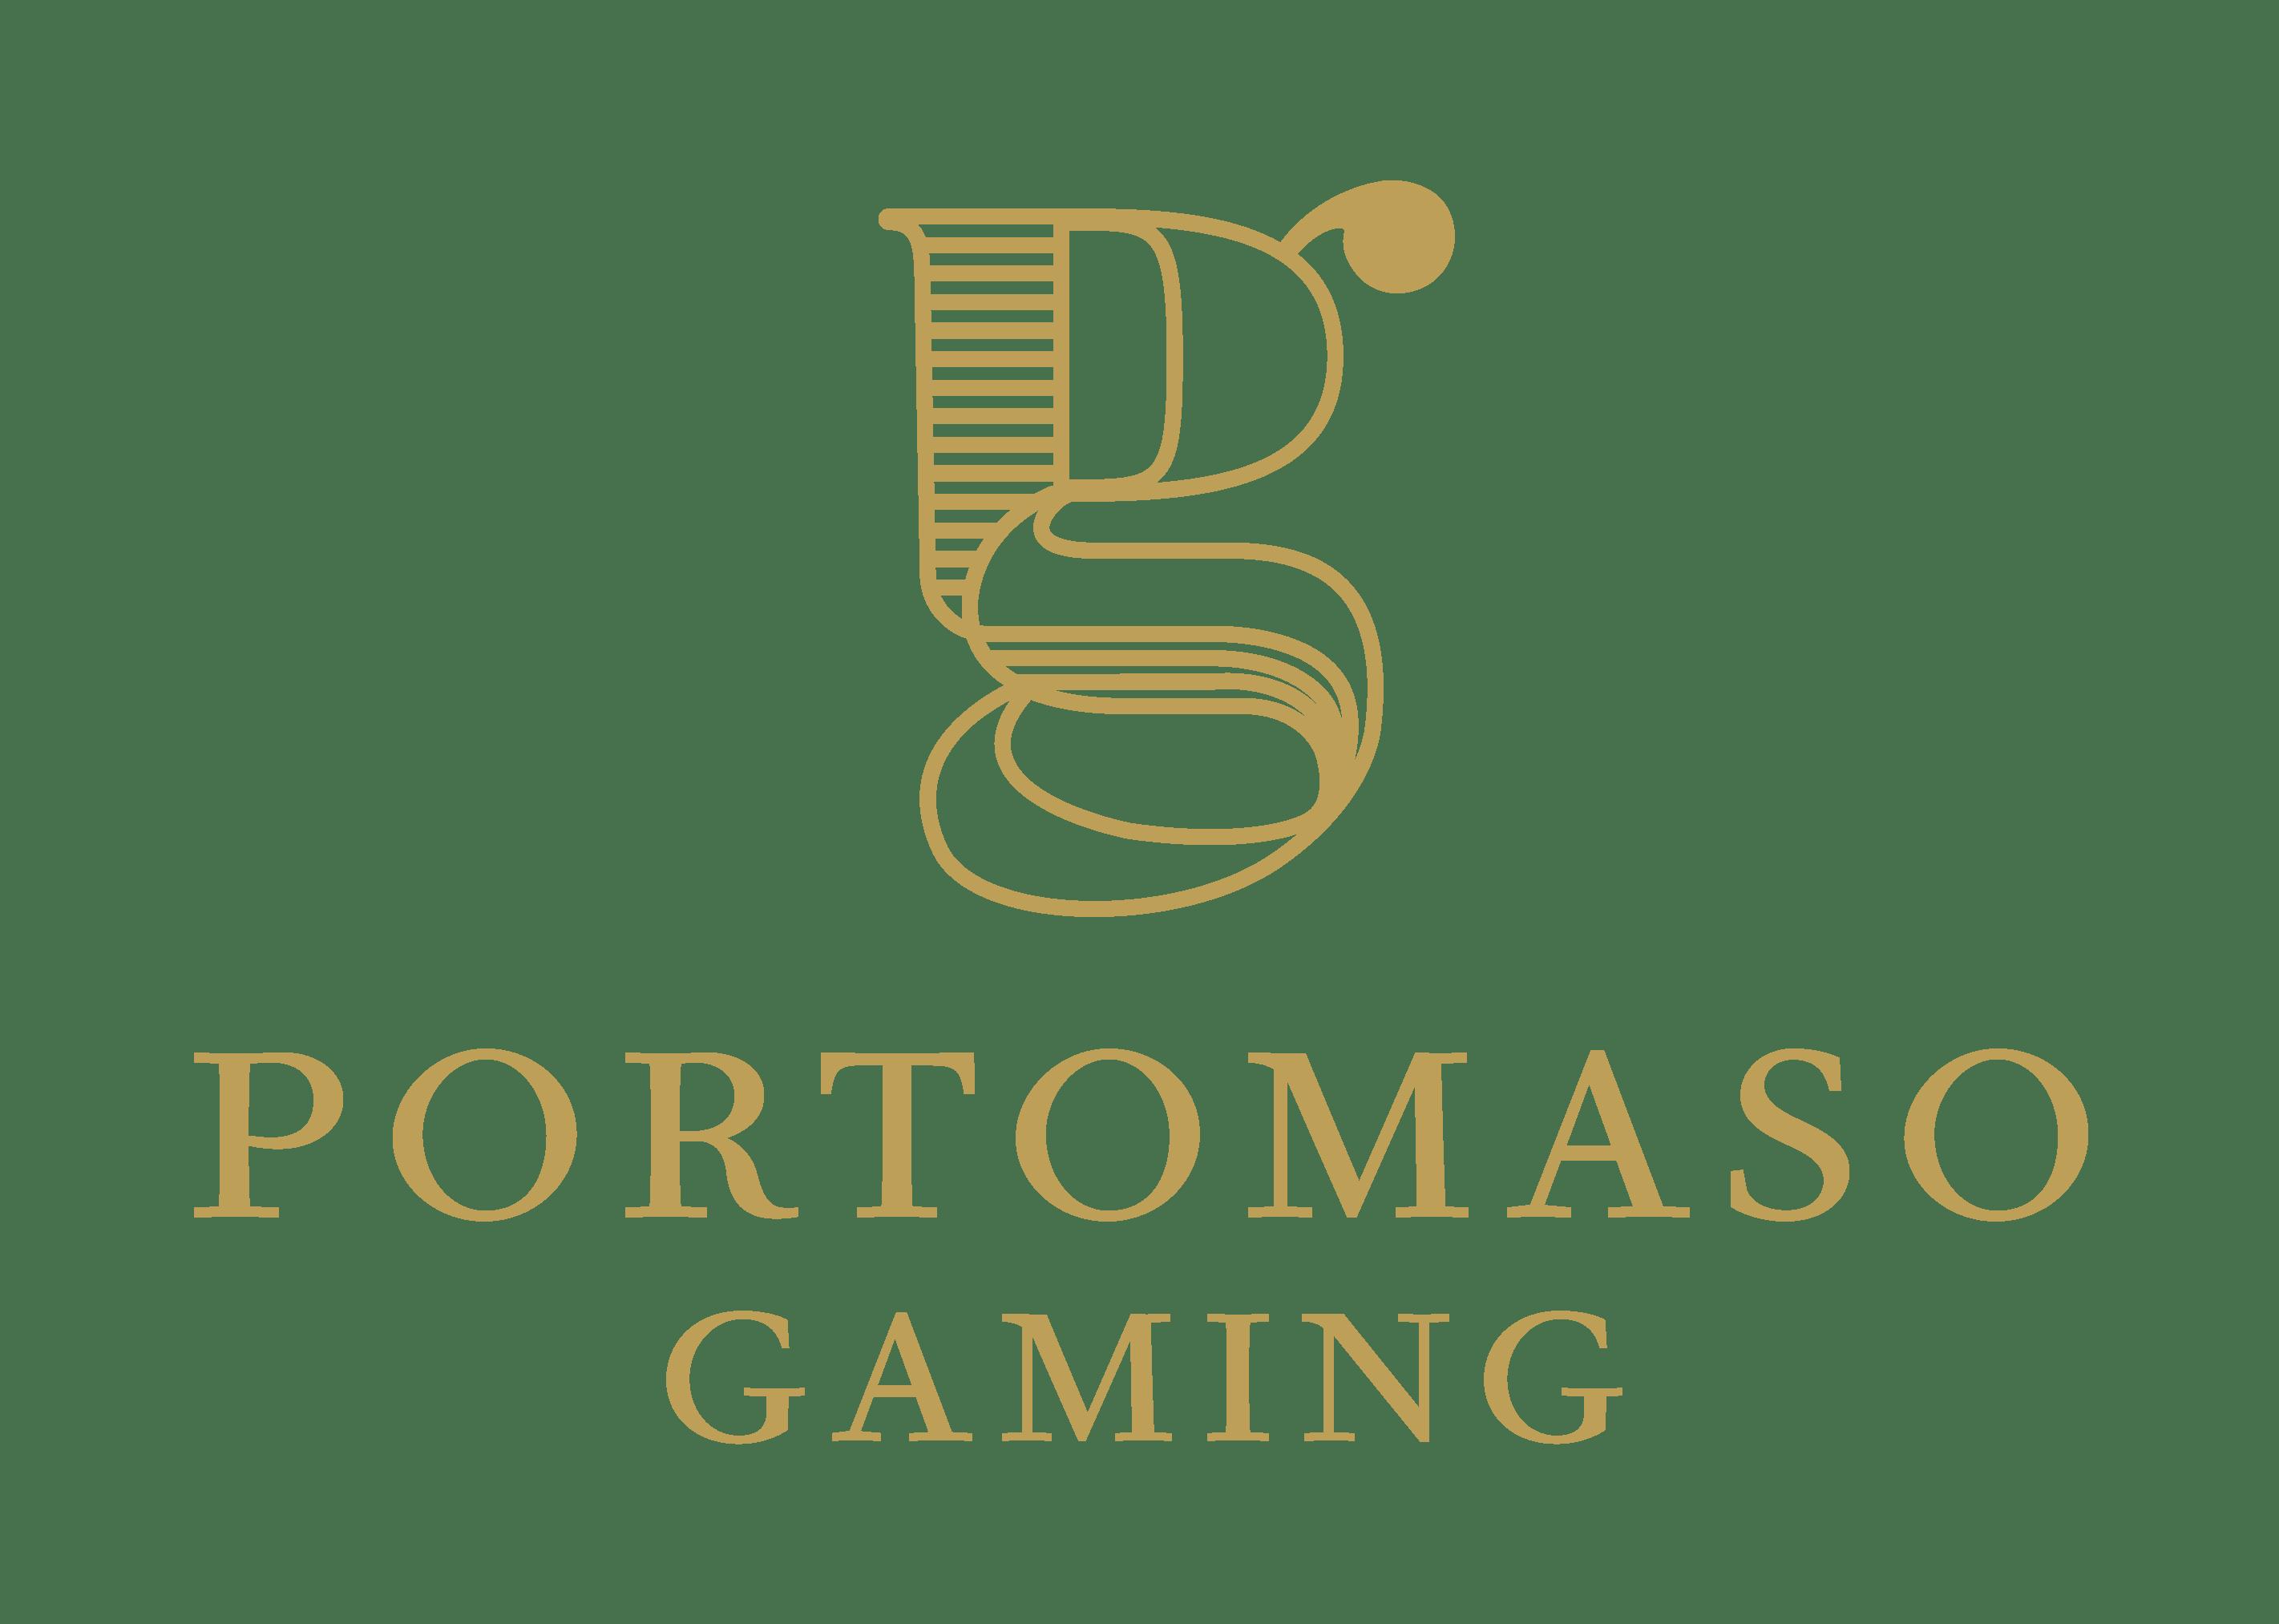 Portomaso Gaming เกม